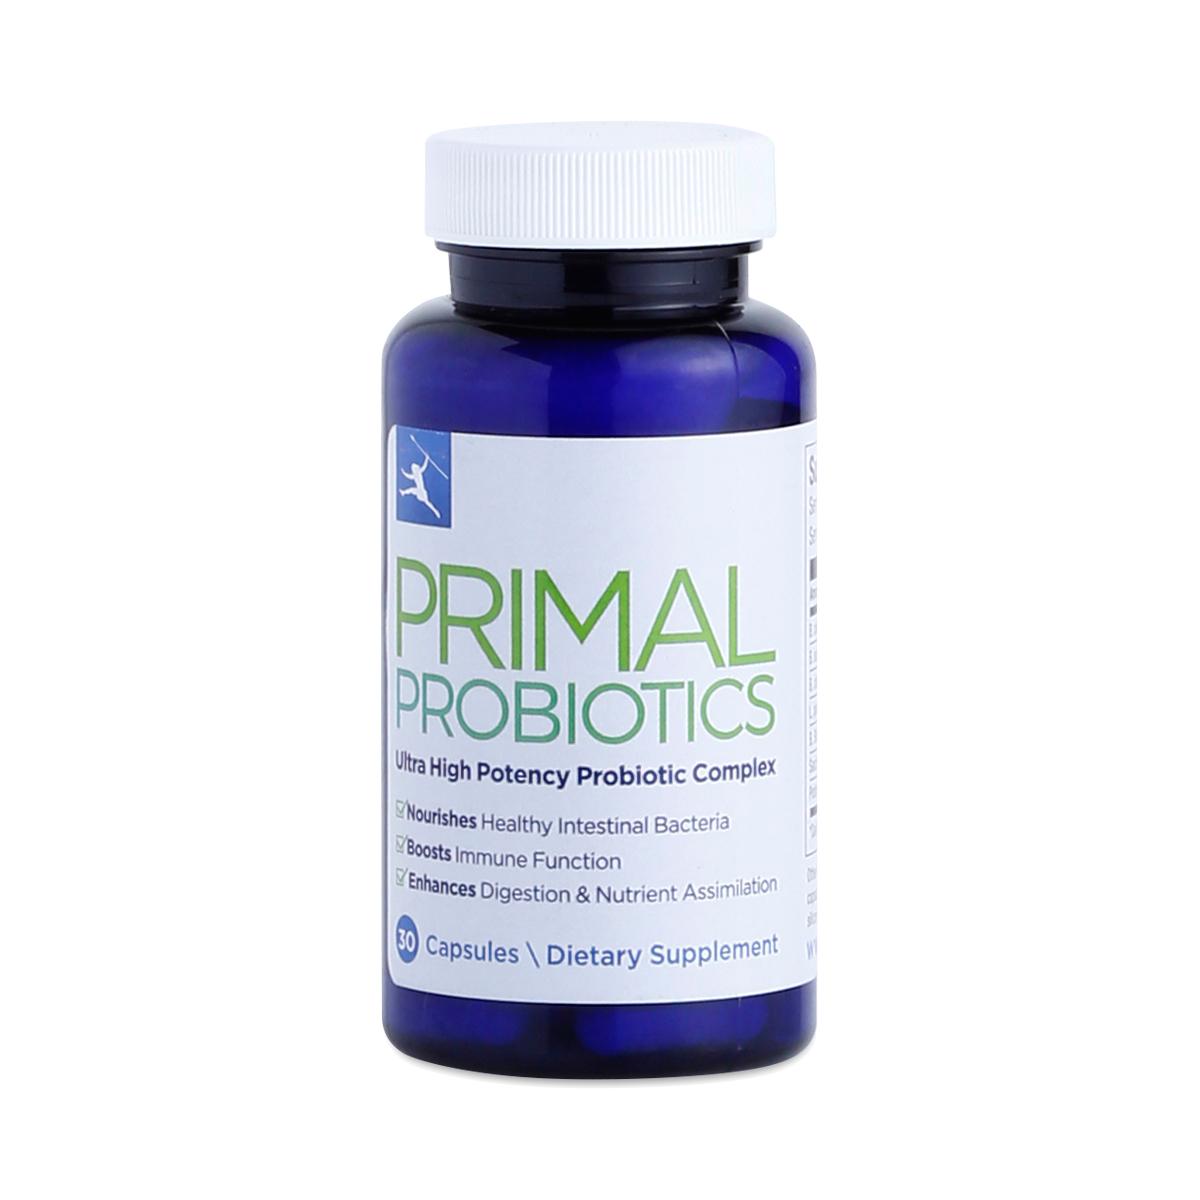 Primal probiotics by primal blueprint thrive market malvernweather Images